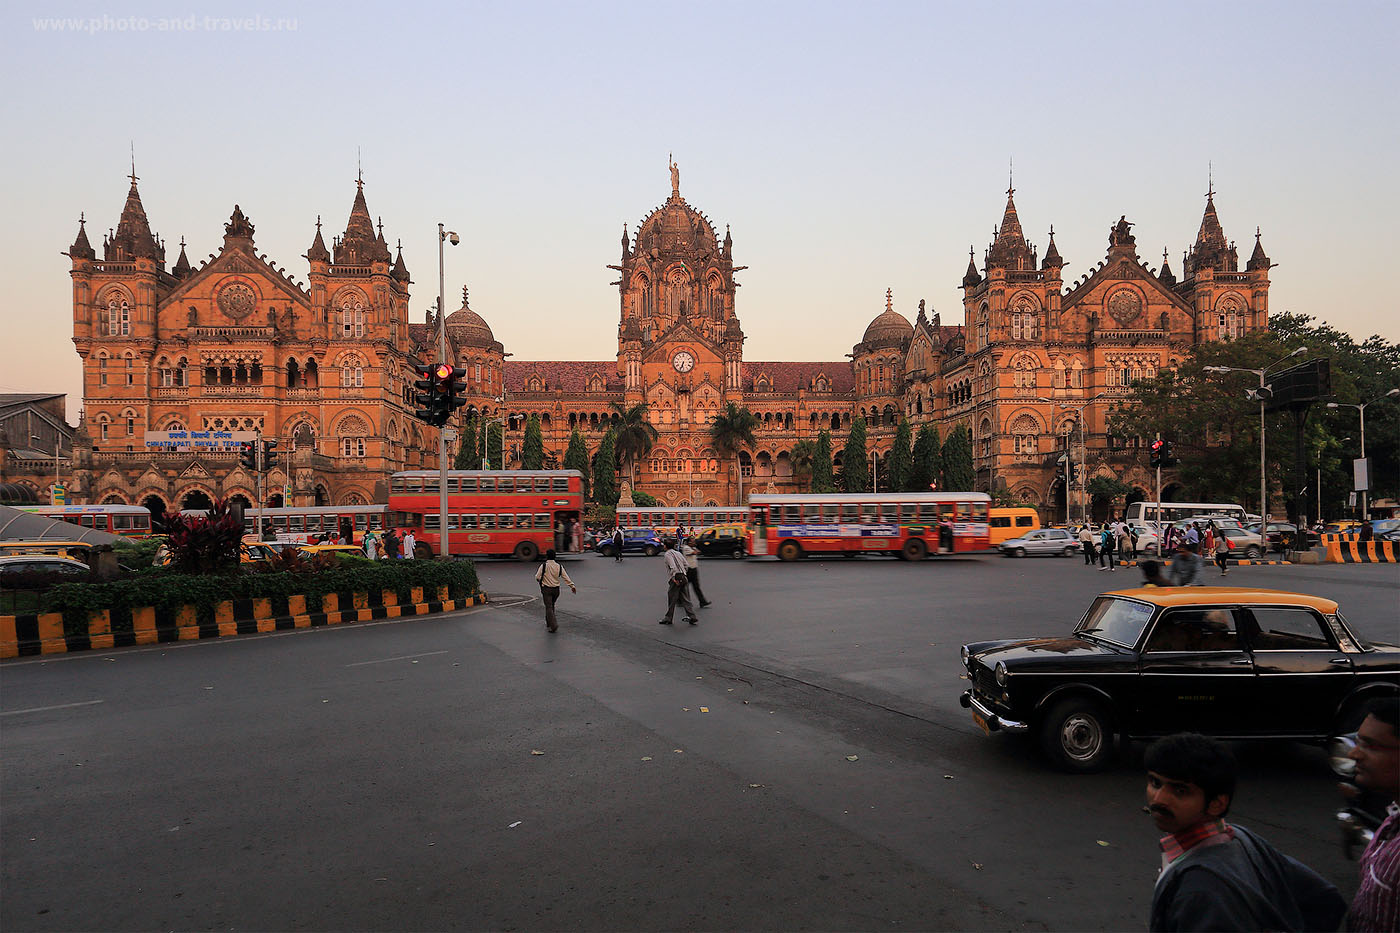 24. Фотография железнодрожного вокзала Чхатрапати Шиваджи в Мумбаи. (1/20, EV=-1, F/7.1, ФР=19мм, ИСО 250)